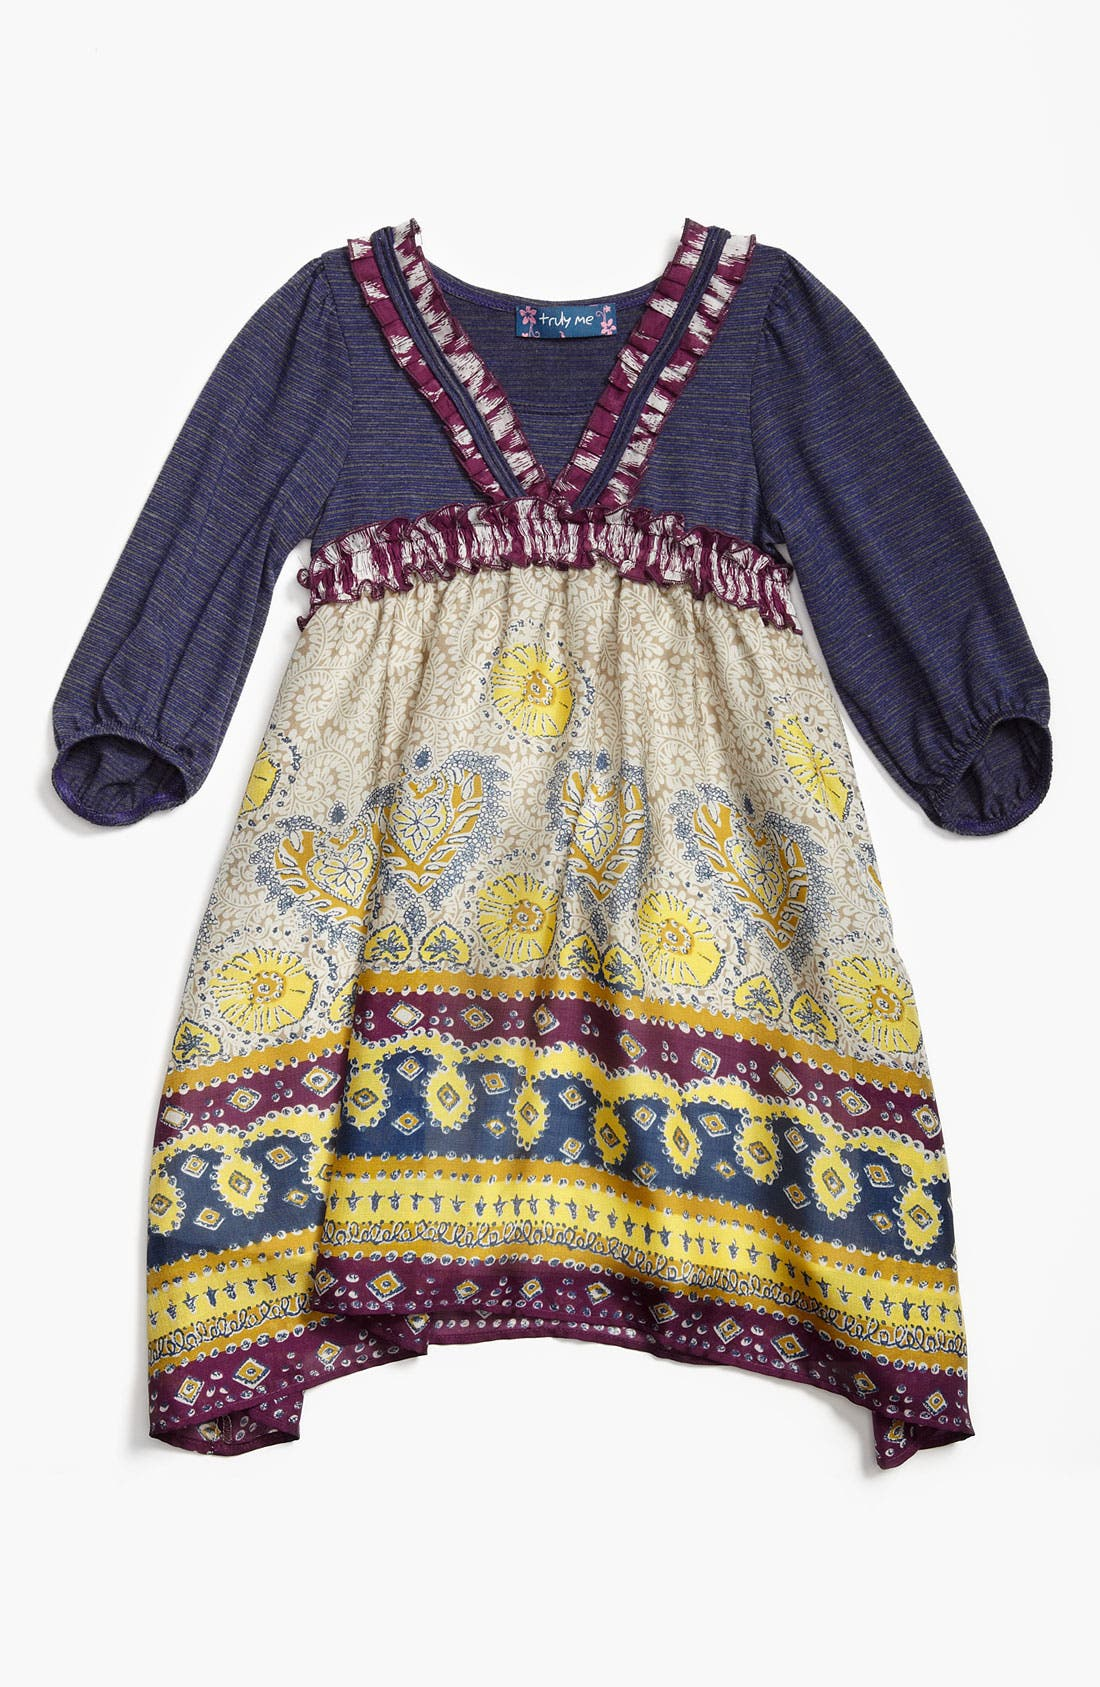 Main Image - Truly Me Knit Dress (Little Girls & Big Girls)